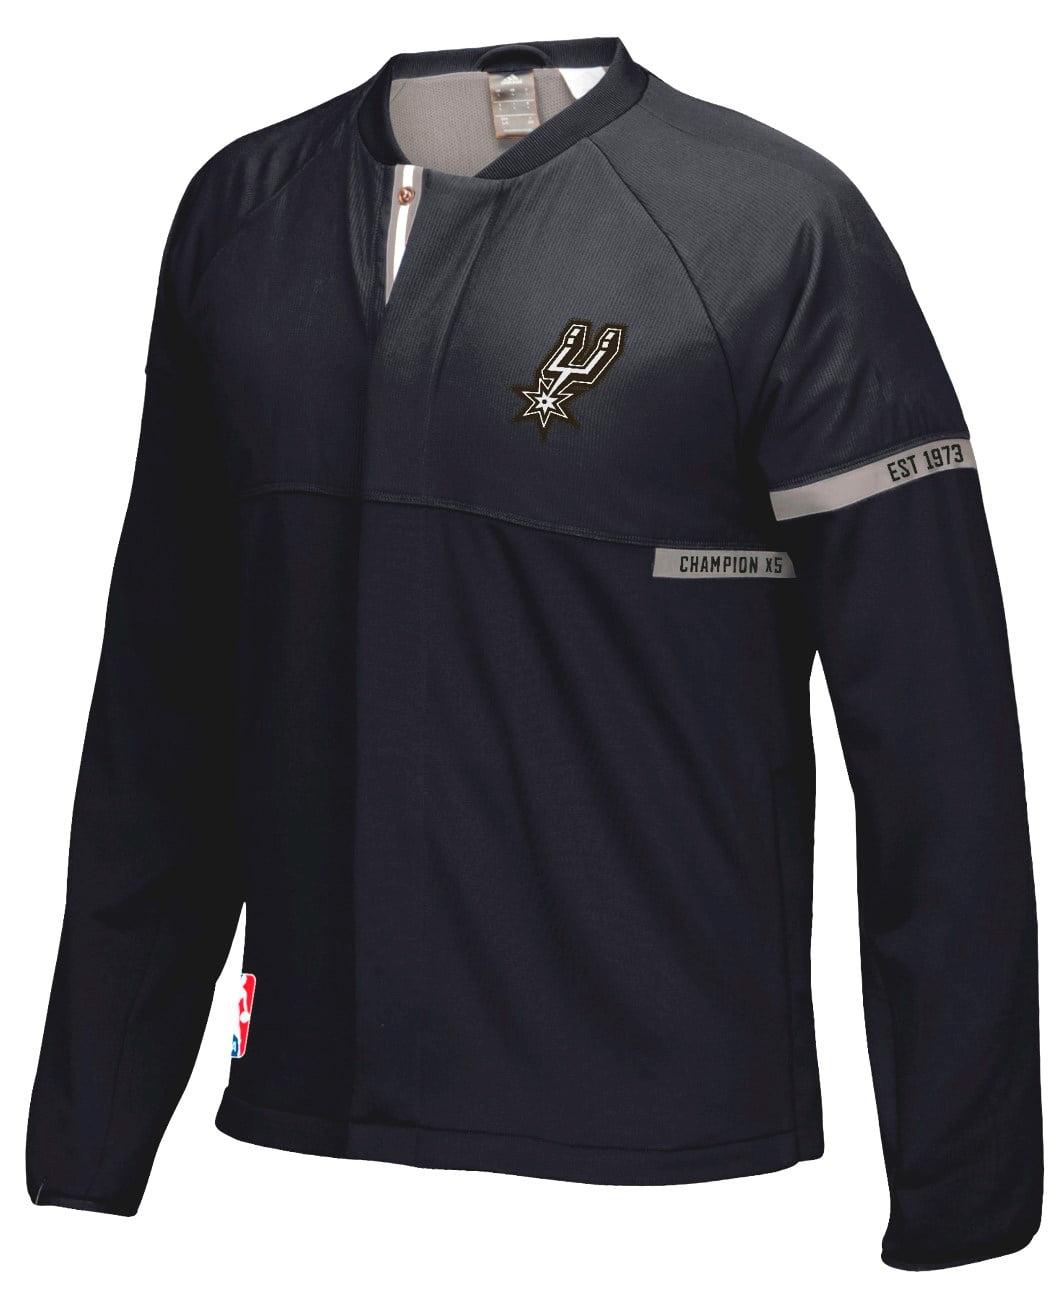 San Antonio Spurs Adidas 2016 NBA Men's On-Court Warm-Up Full Zip Jacket by Adidas